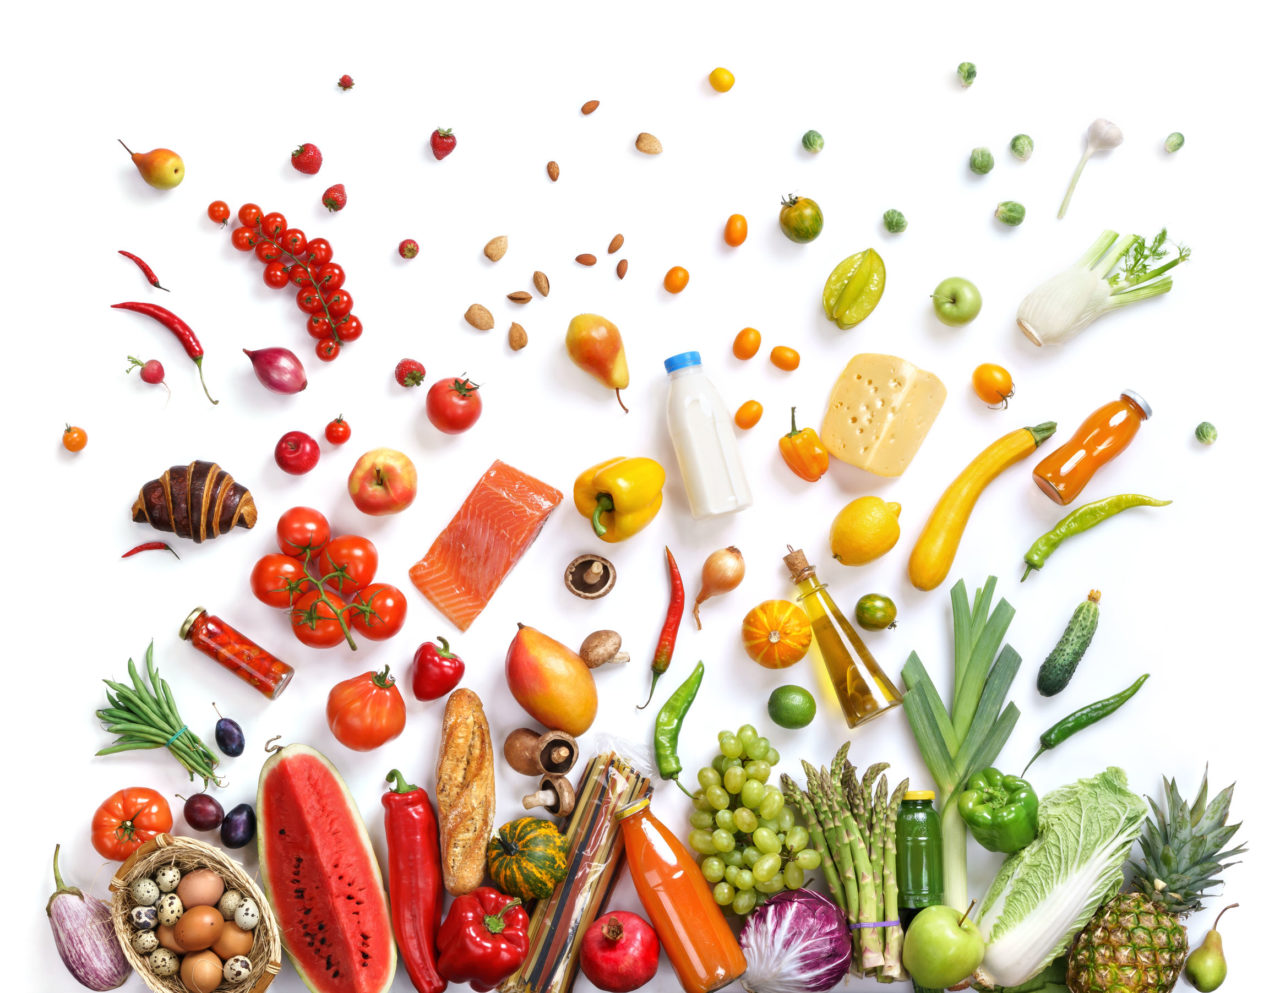 aliments-arc-en-ciel-1280x993.jpg